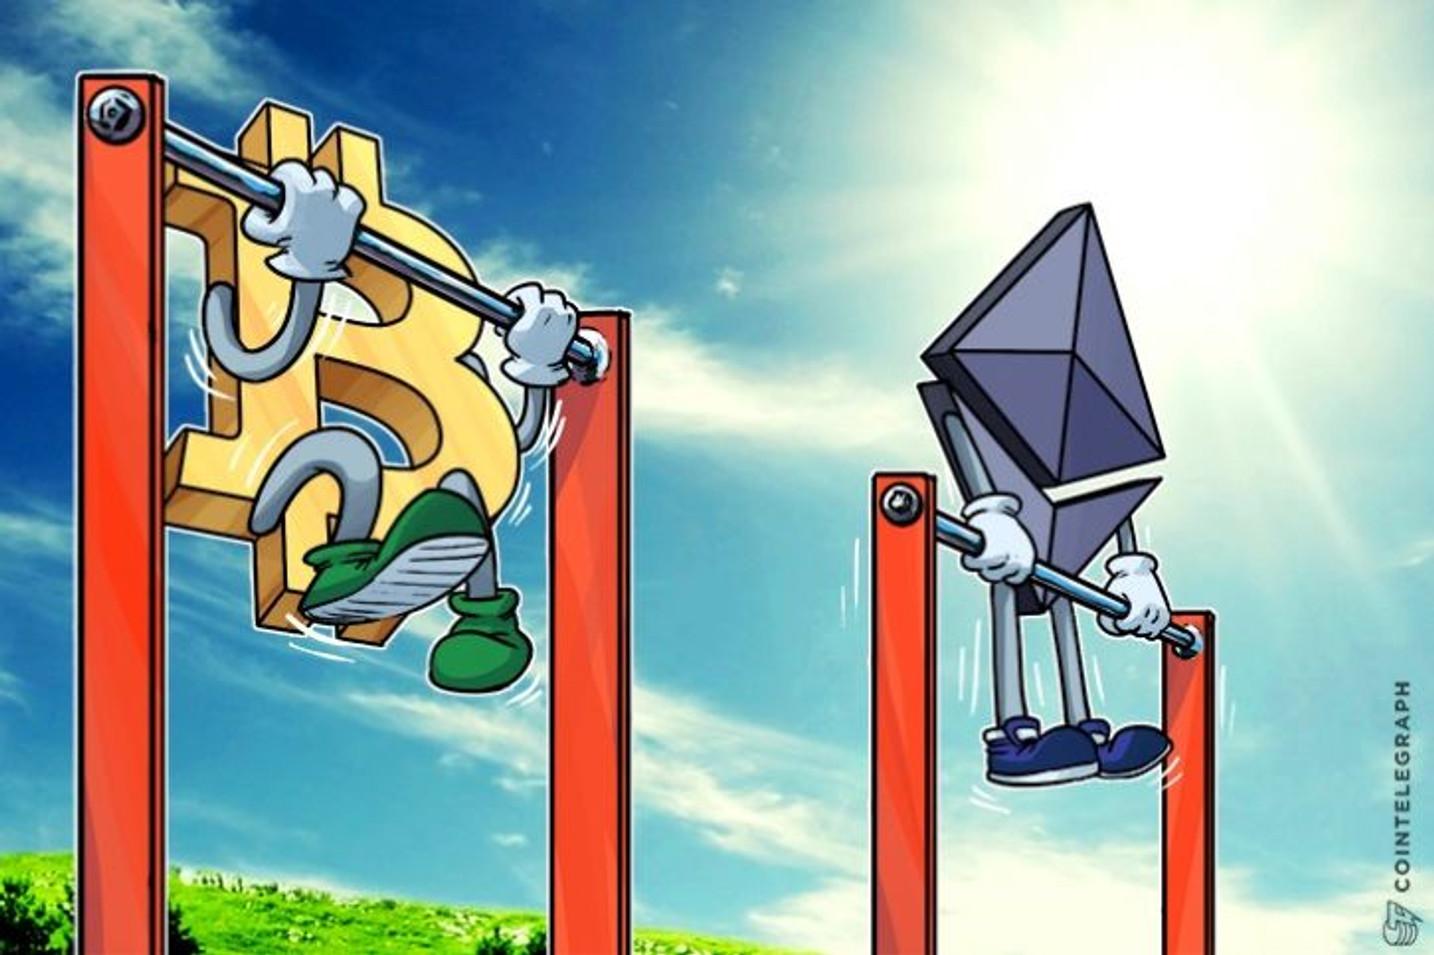 Bitkoinova tržišna dominacija opada, dok ethereum raste